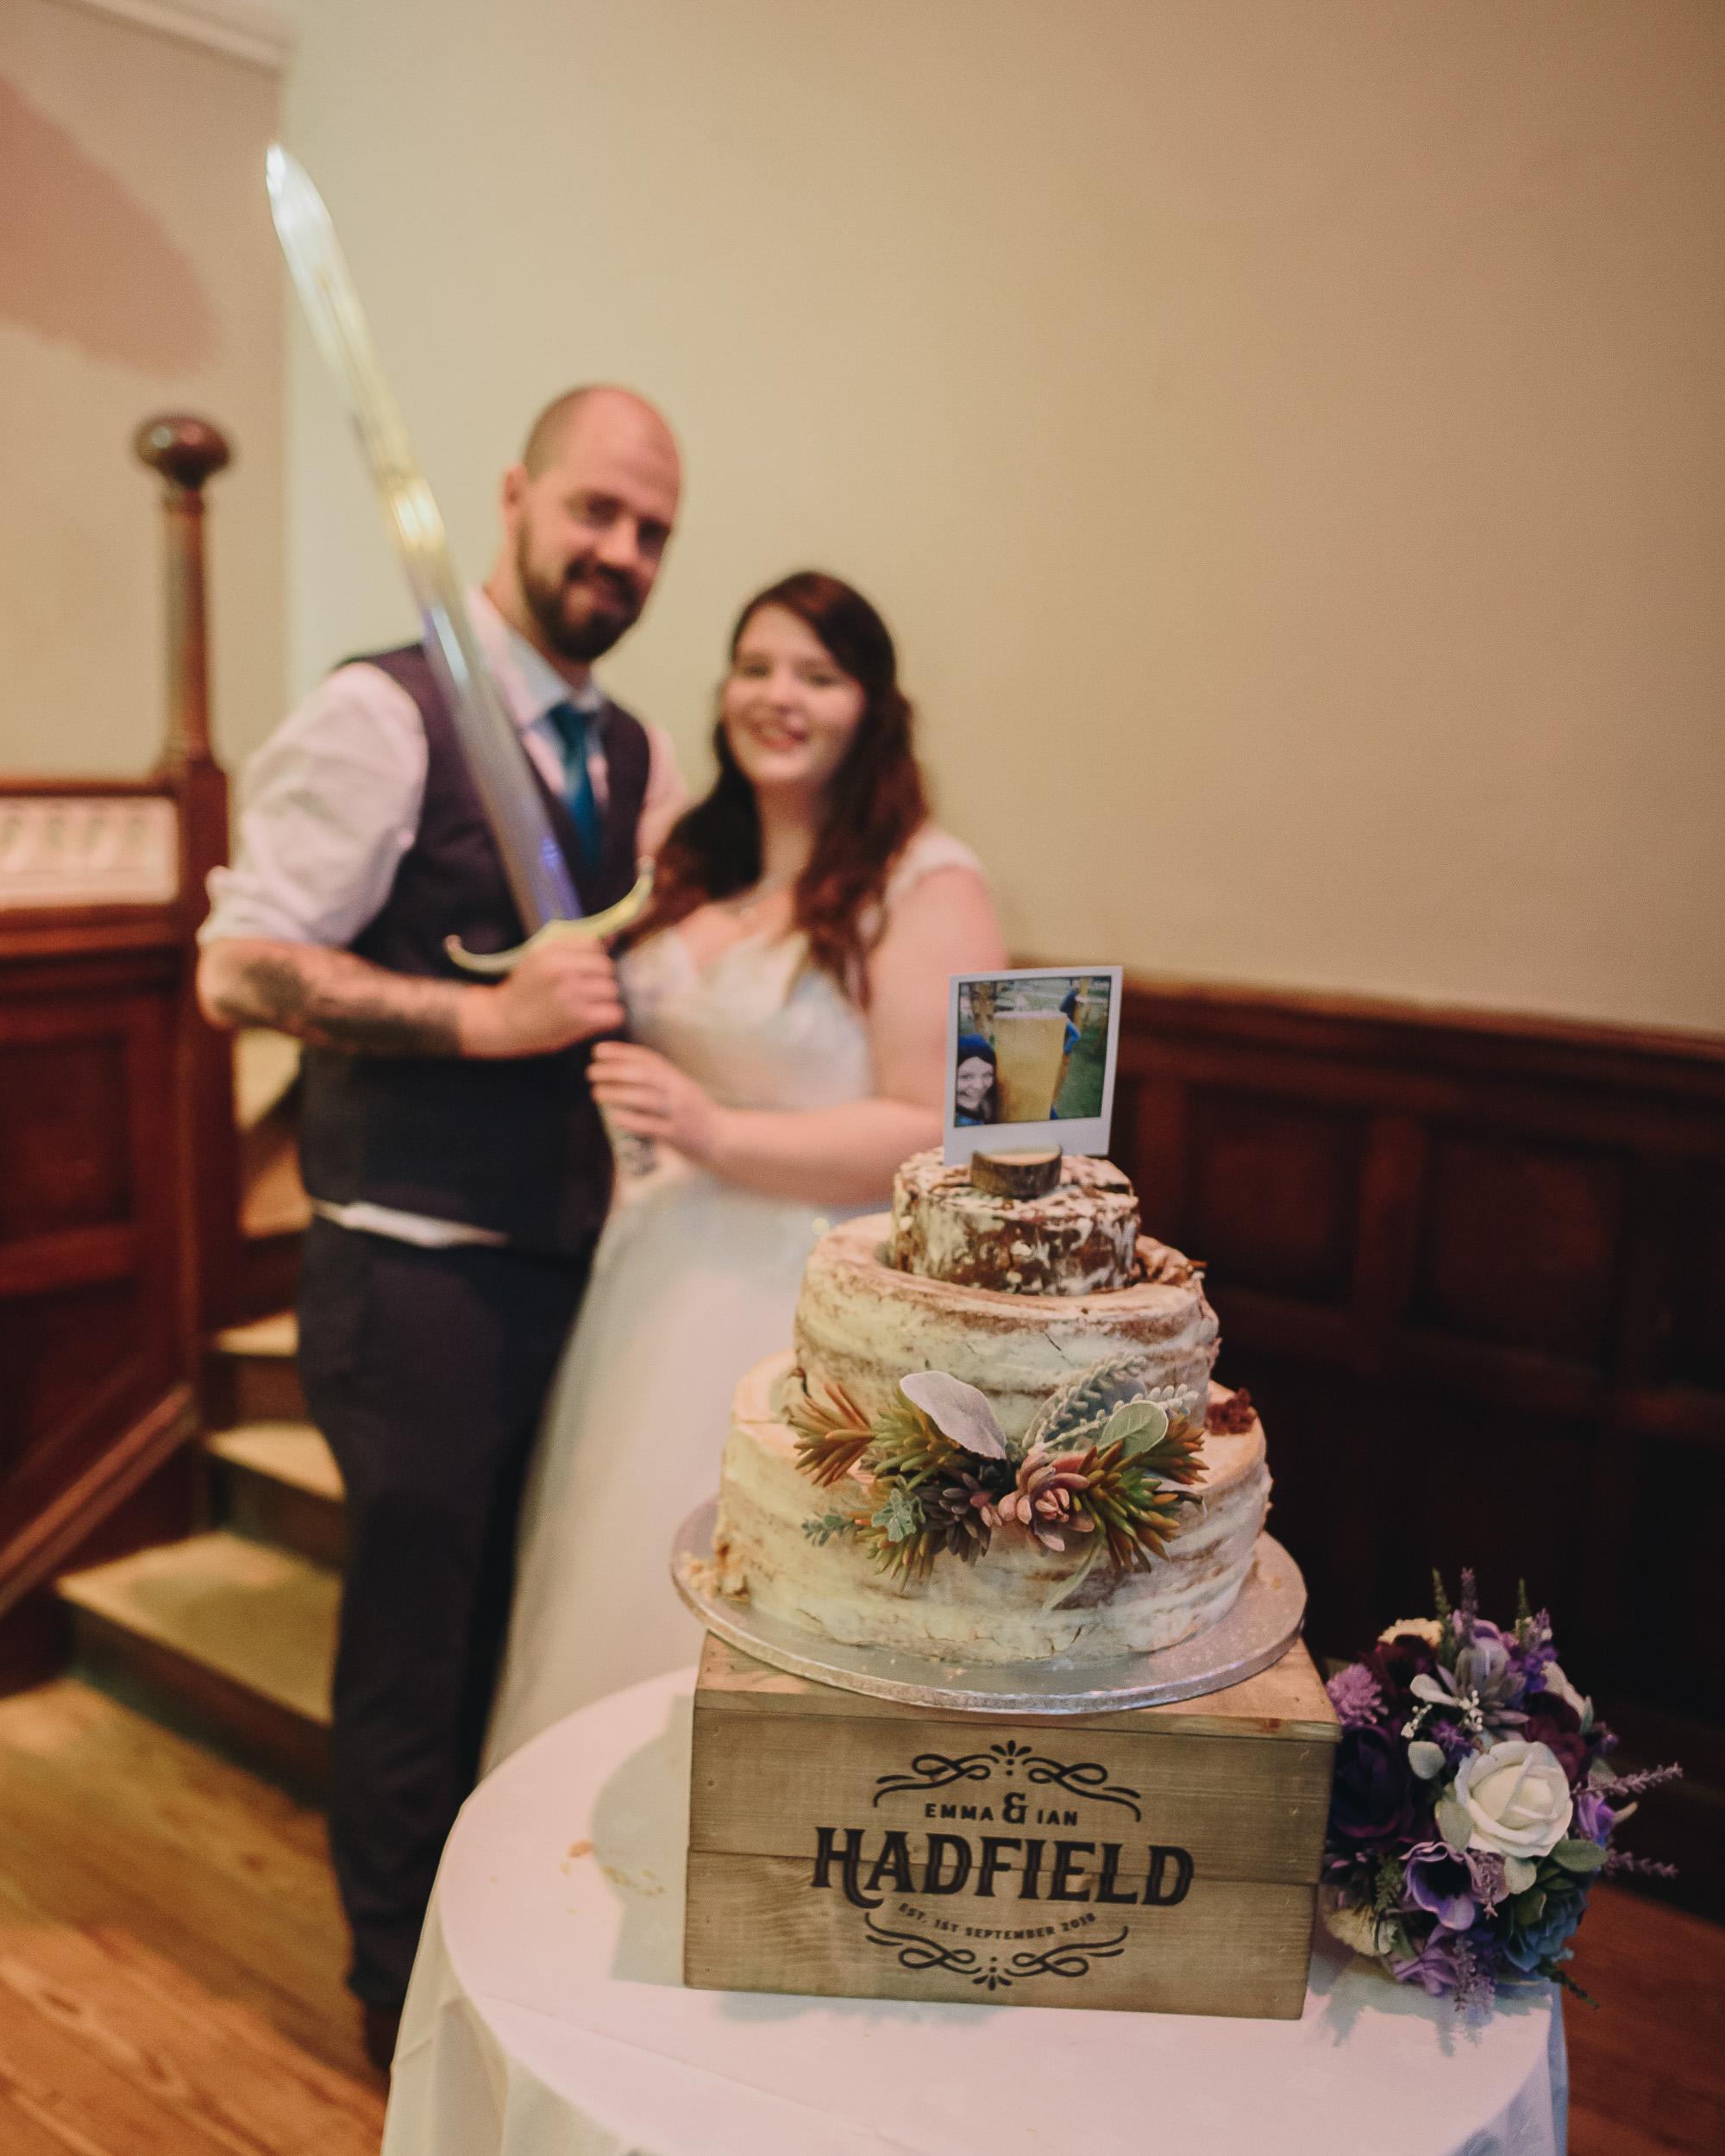 Smithills-hall-wedding-manchester-the-barlow-edgworth-hadfield-115.jpg